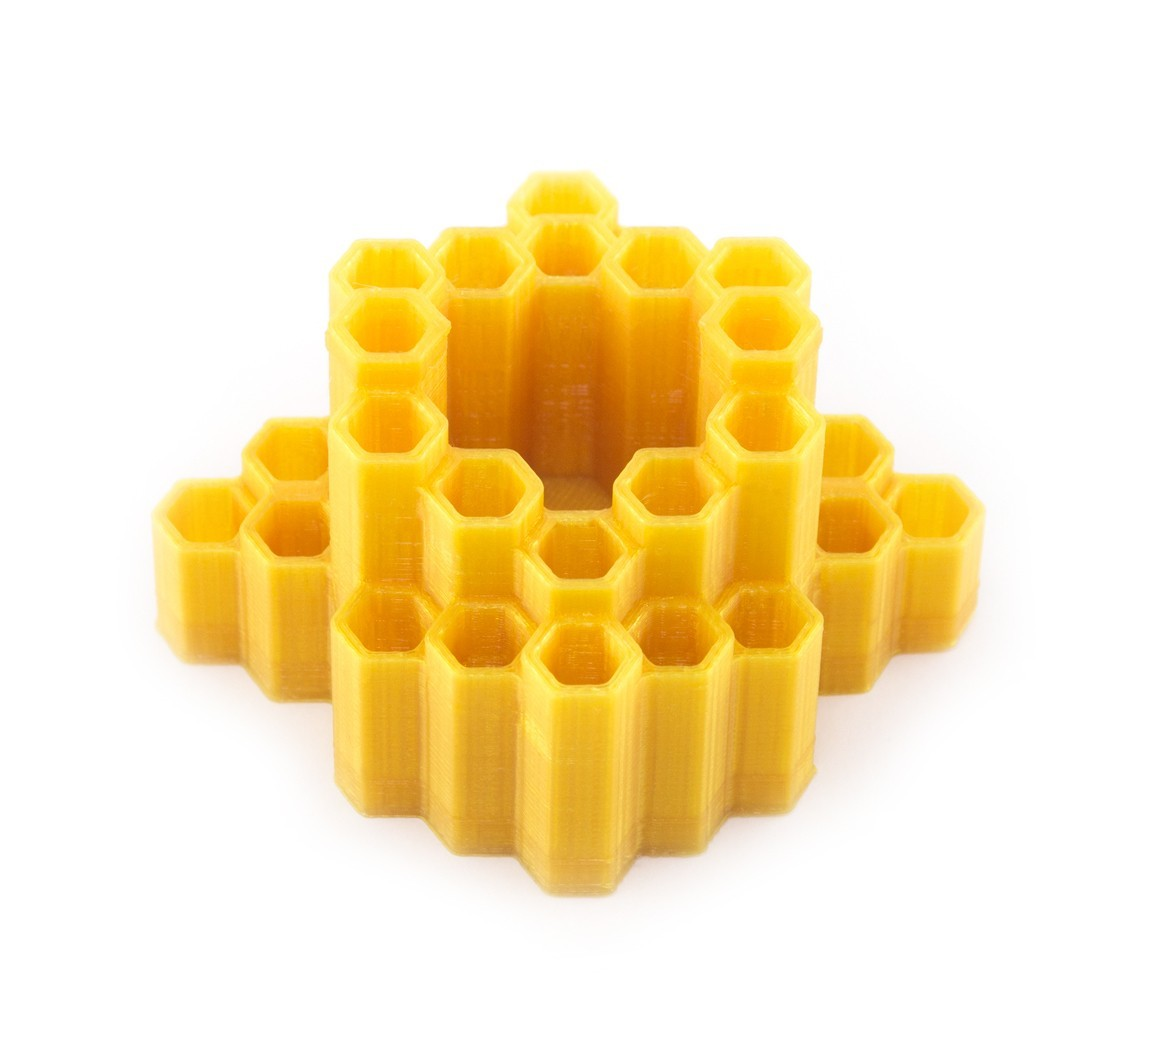 210367df949ca690fe7a9479b1862815_1452537391598_01.07.15-product-shoot-055.jpg Download free STL file Honeycomb Cup • 3D print model, Terryyy